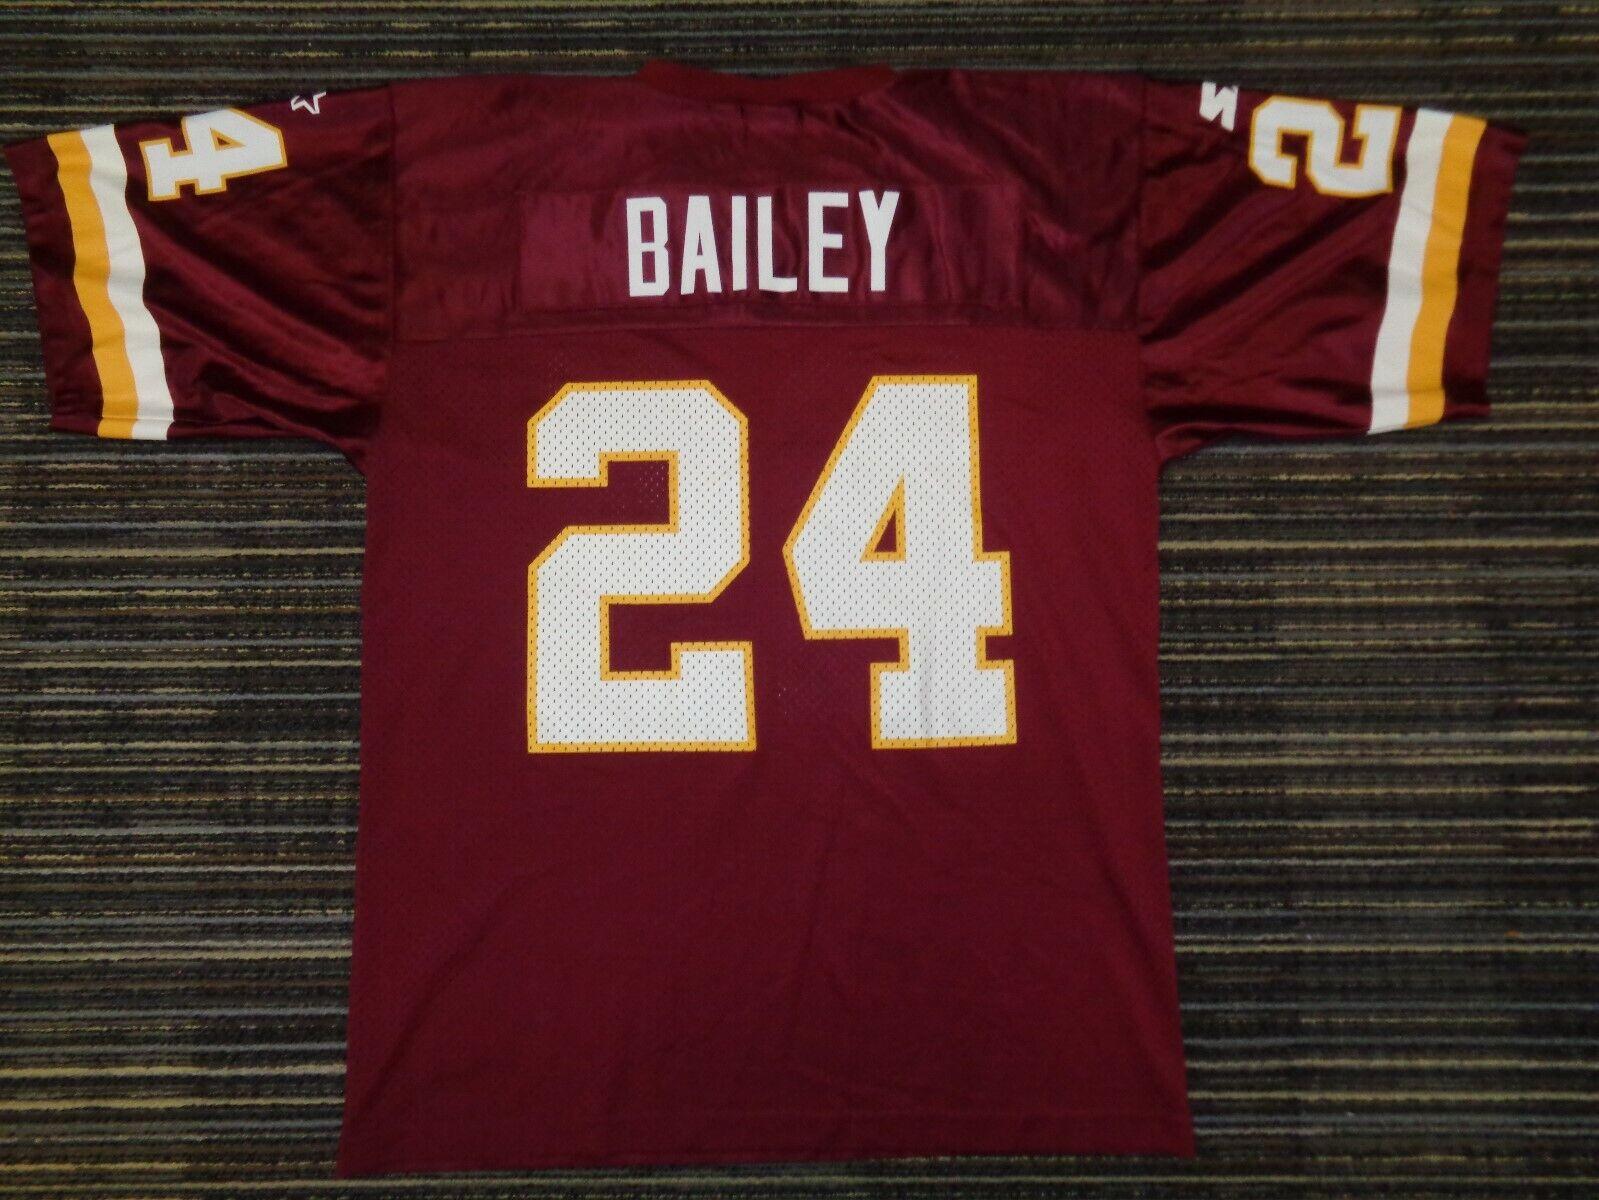 CHAMP BAILEY 24 WASHINGTON REDSKINS STARTER NFL GAME FOOTBALL TEAM JERSEY SZ LG - $29.99